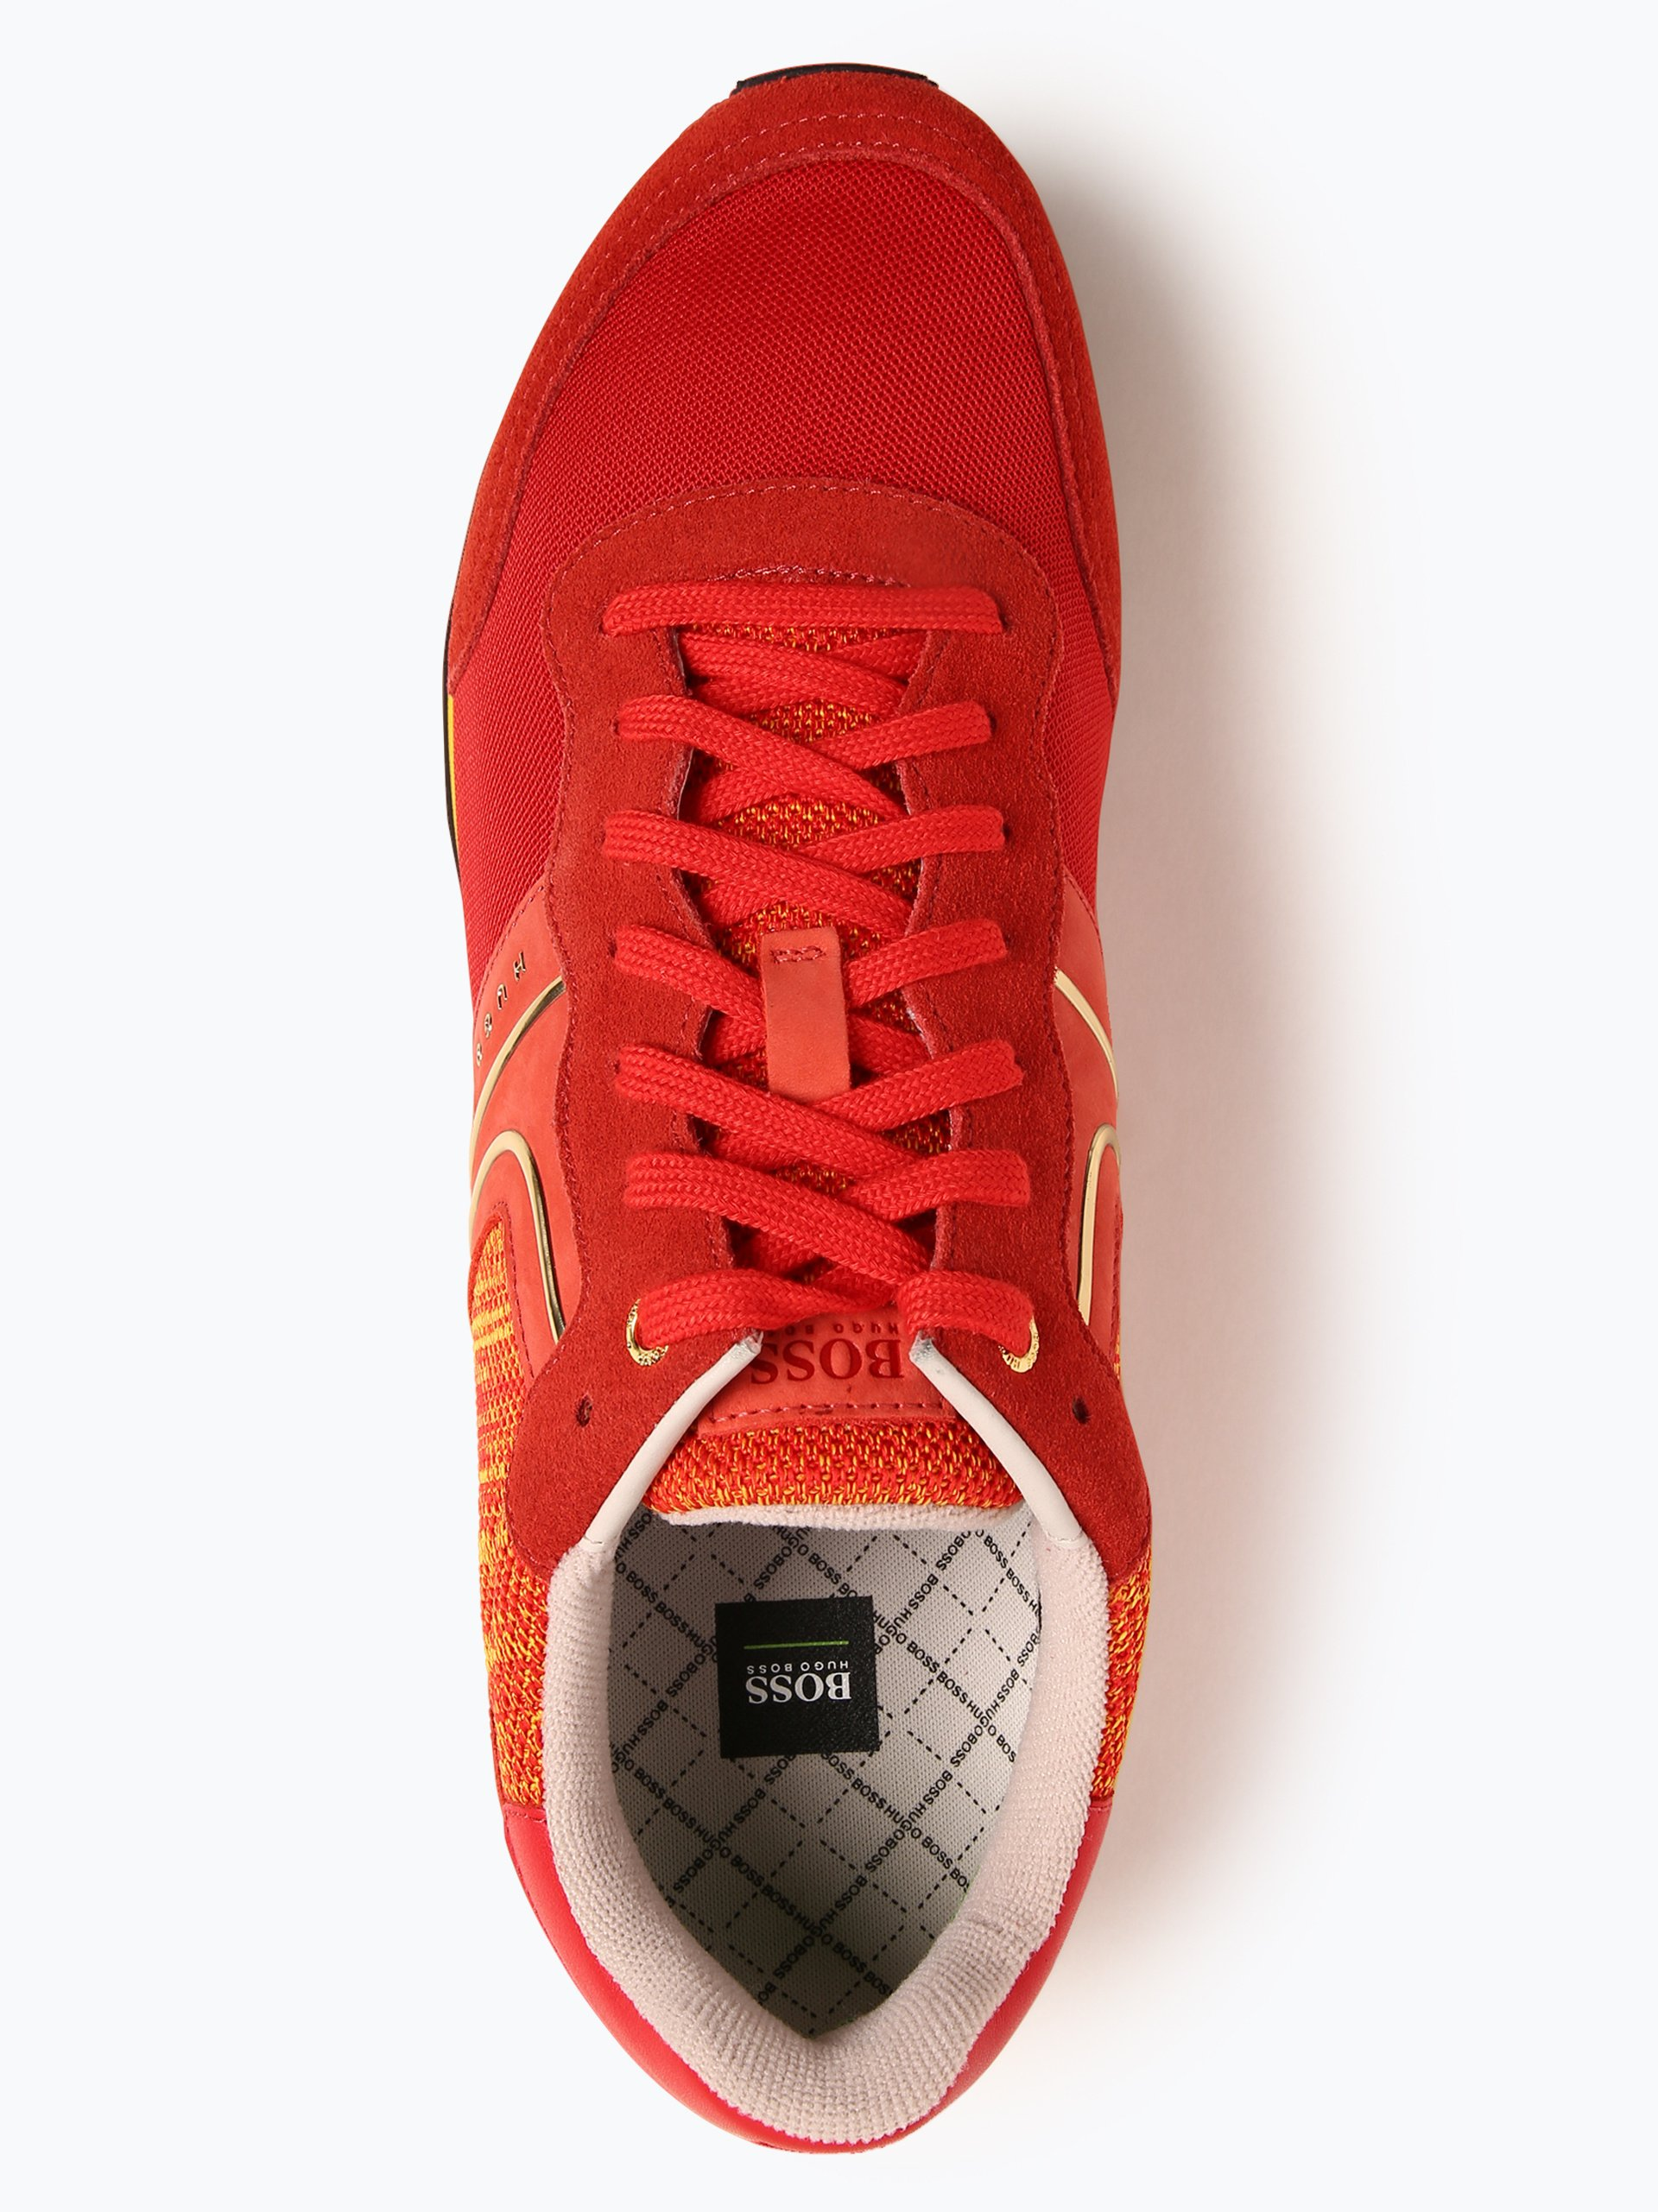 BOSS Athleisure Herren Sneaker mit Leder-Anteil - Parkour_Runn_flag